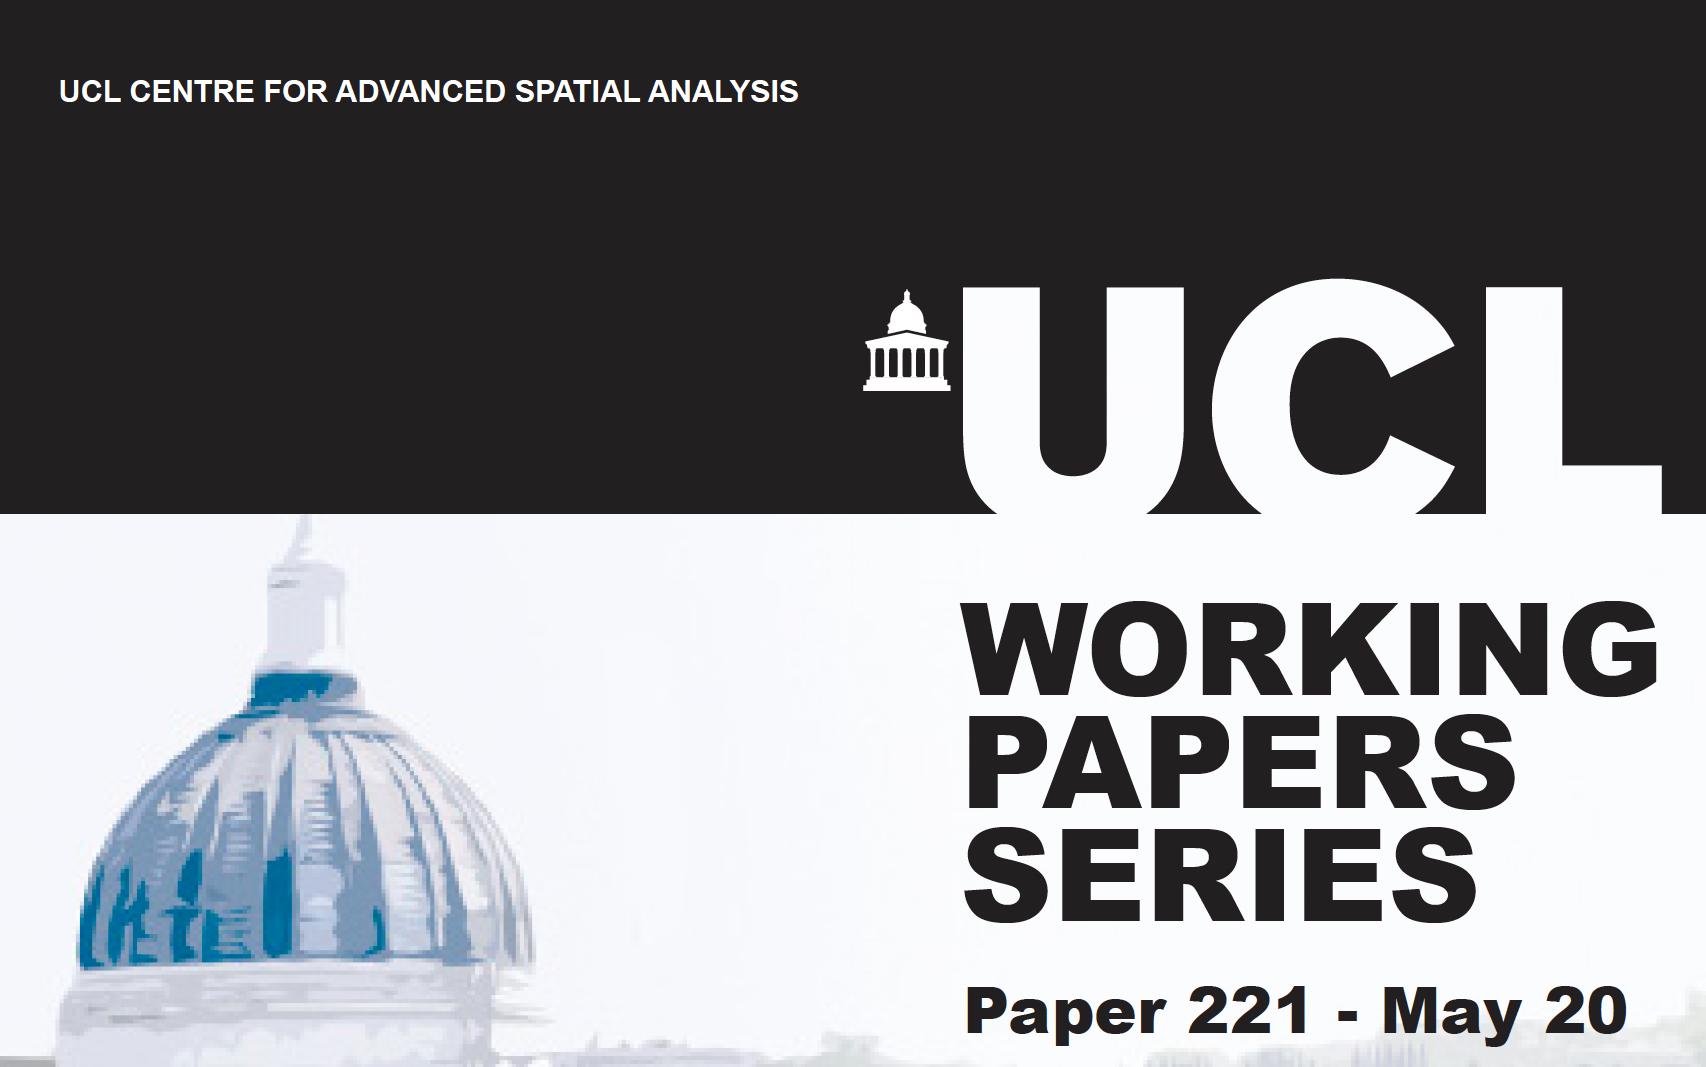 CASA Working Paper 221